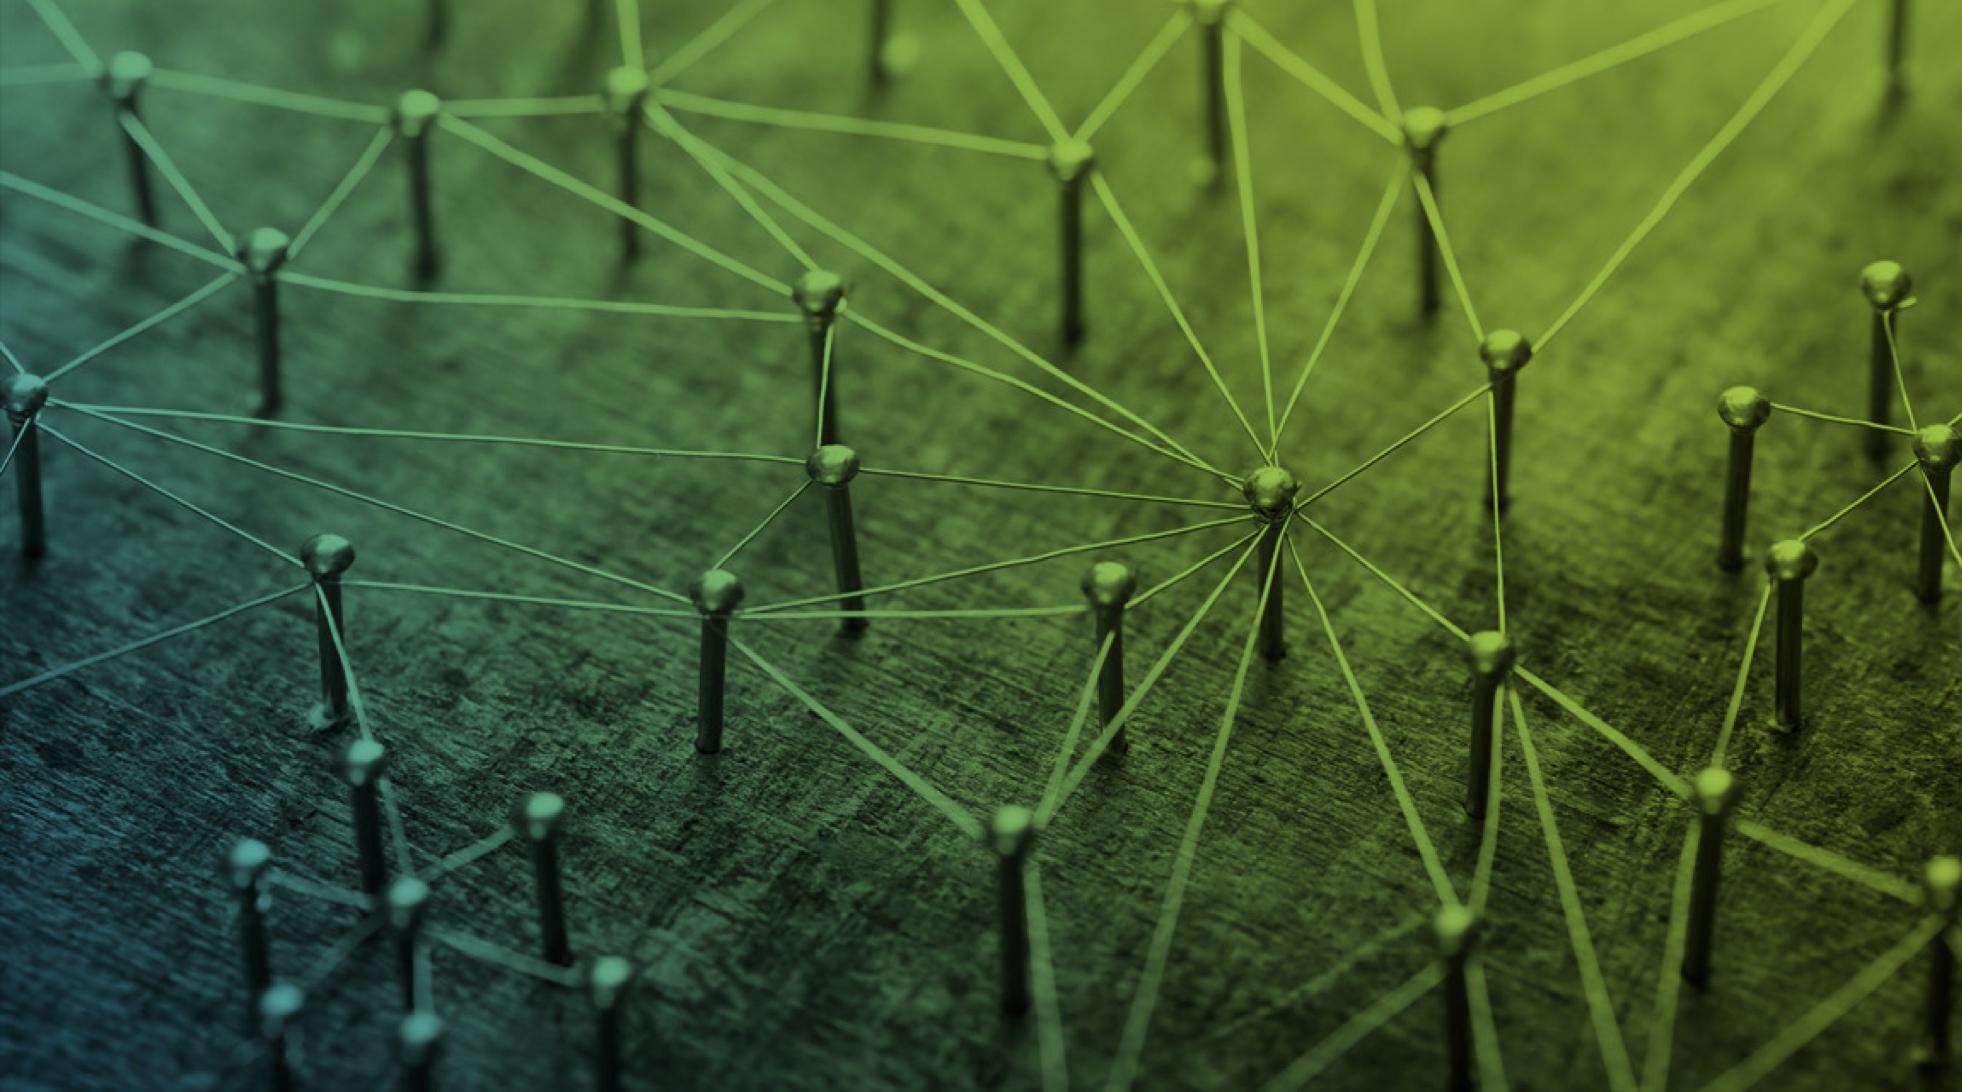 Free Radical Network debate ccg